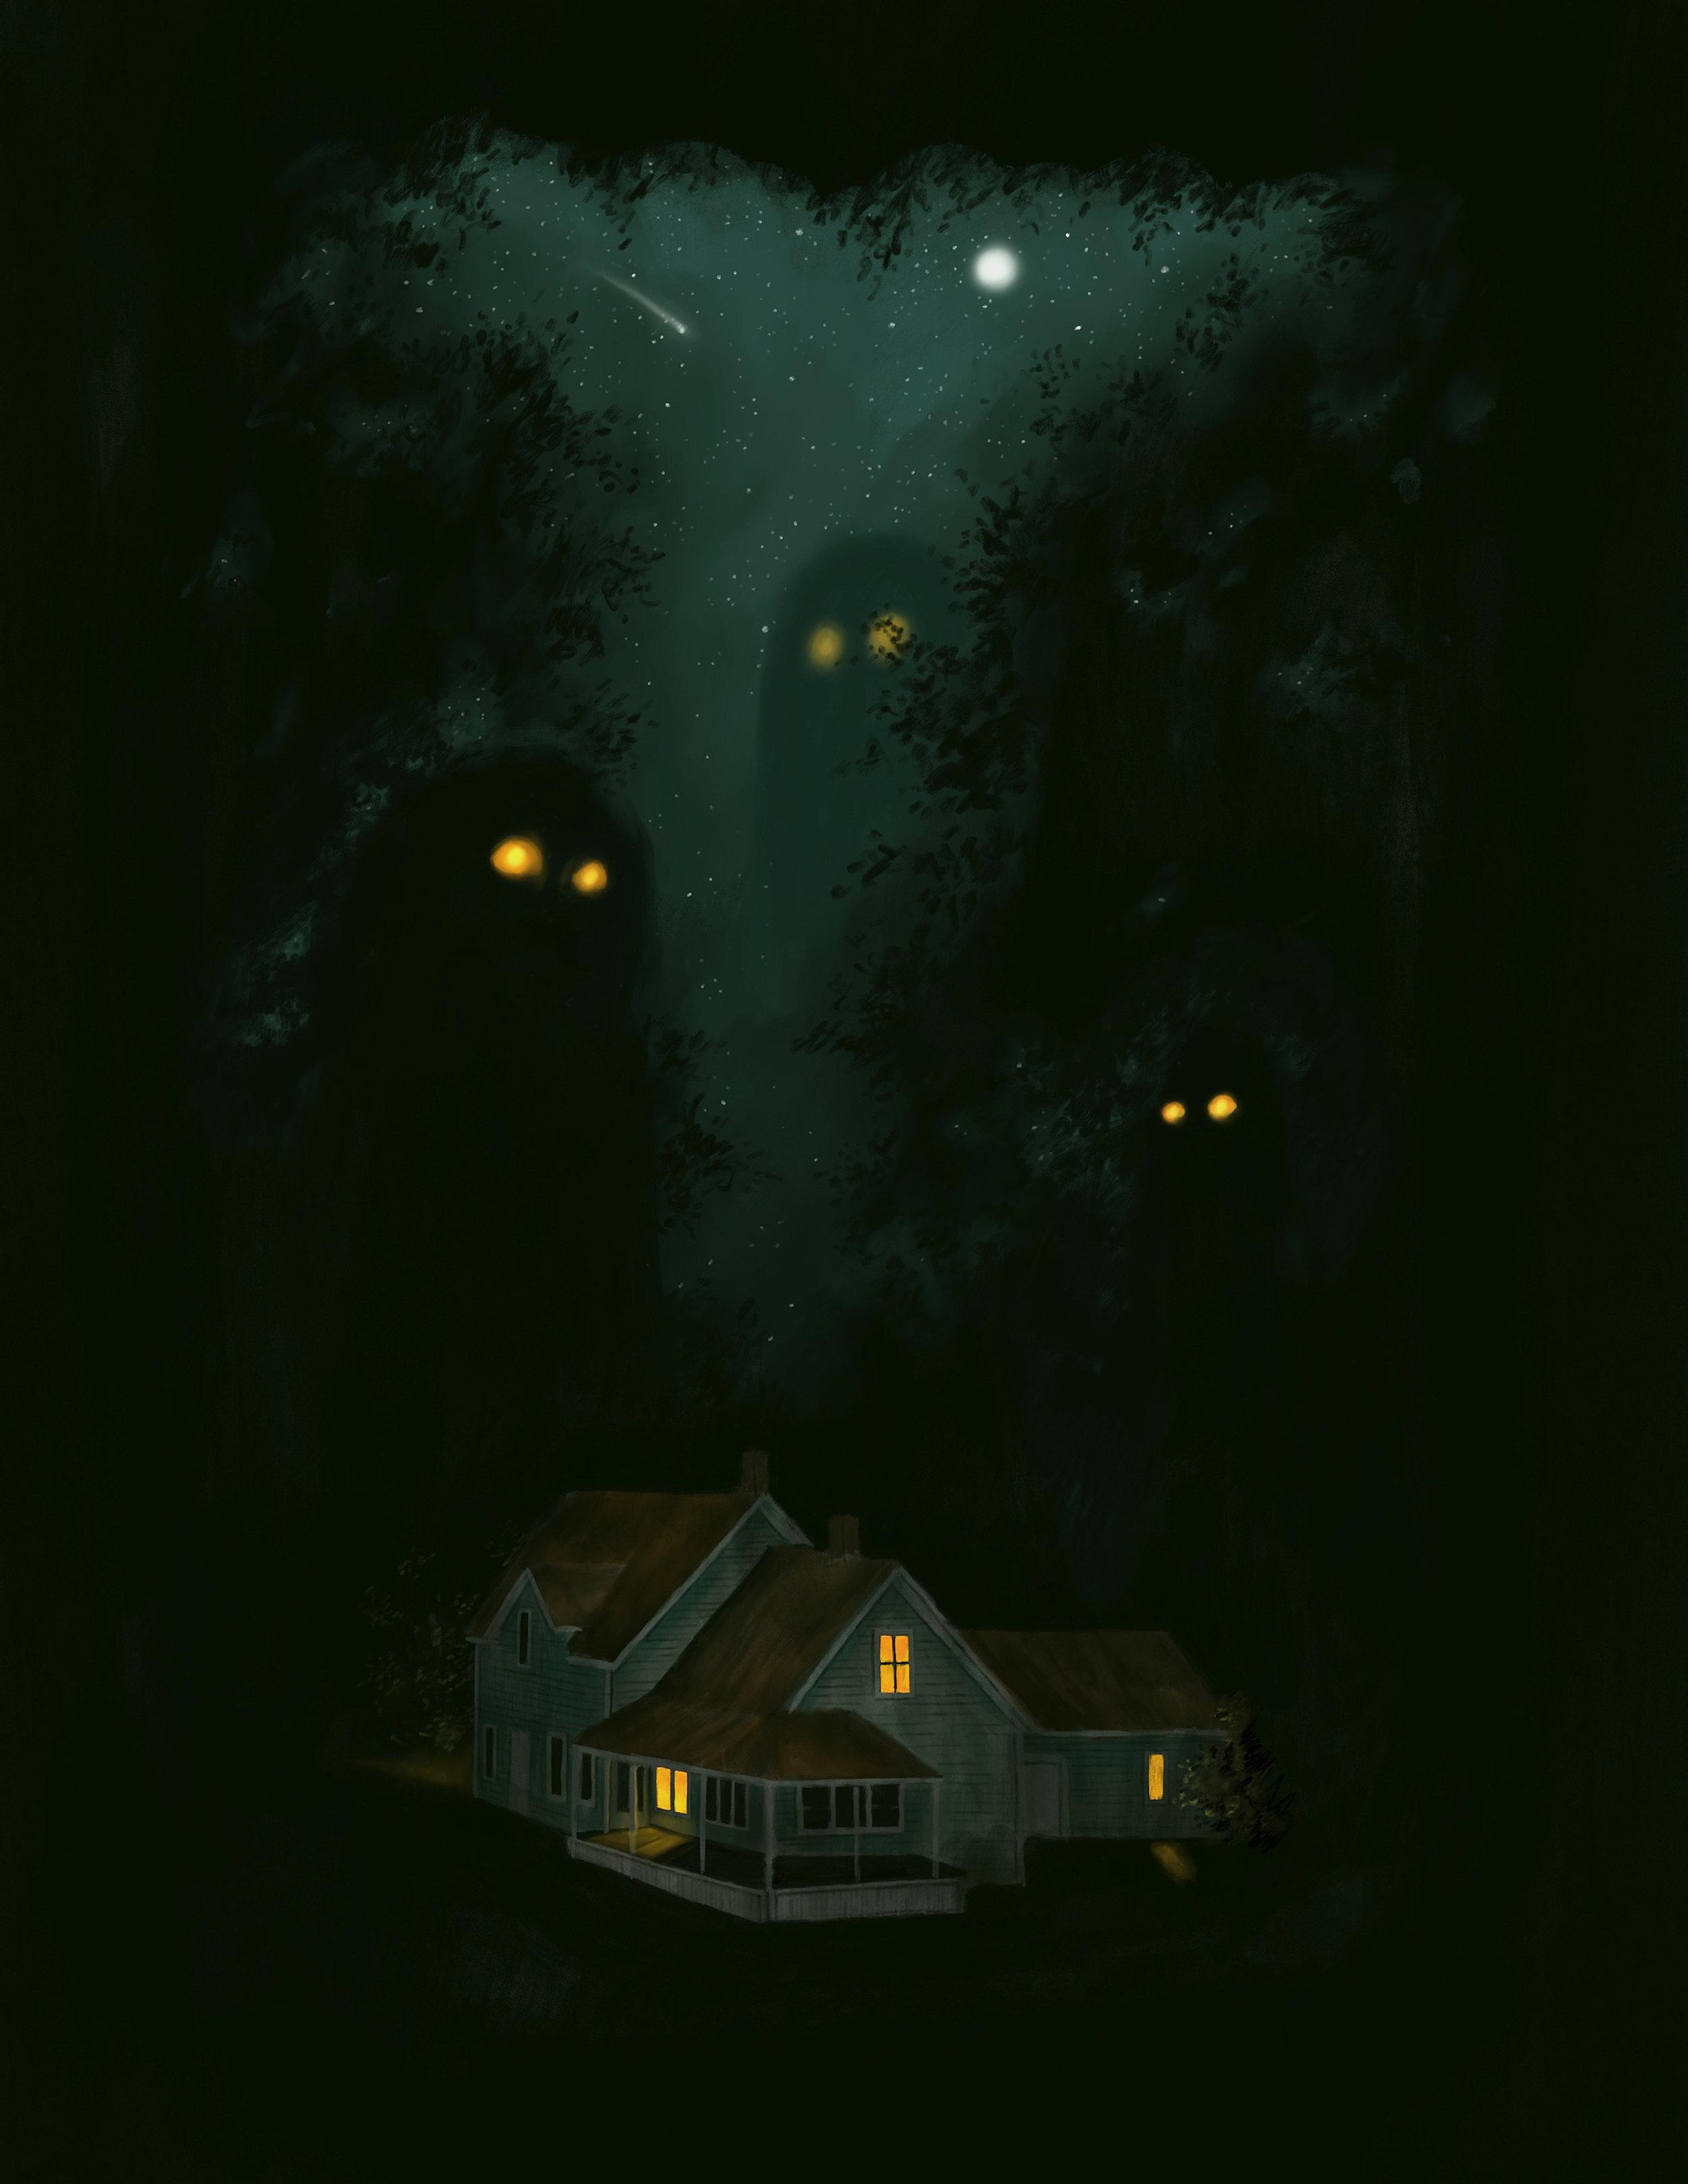 Late night visit